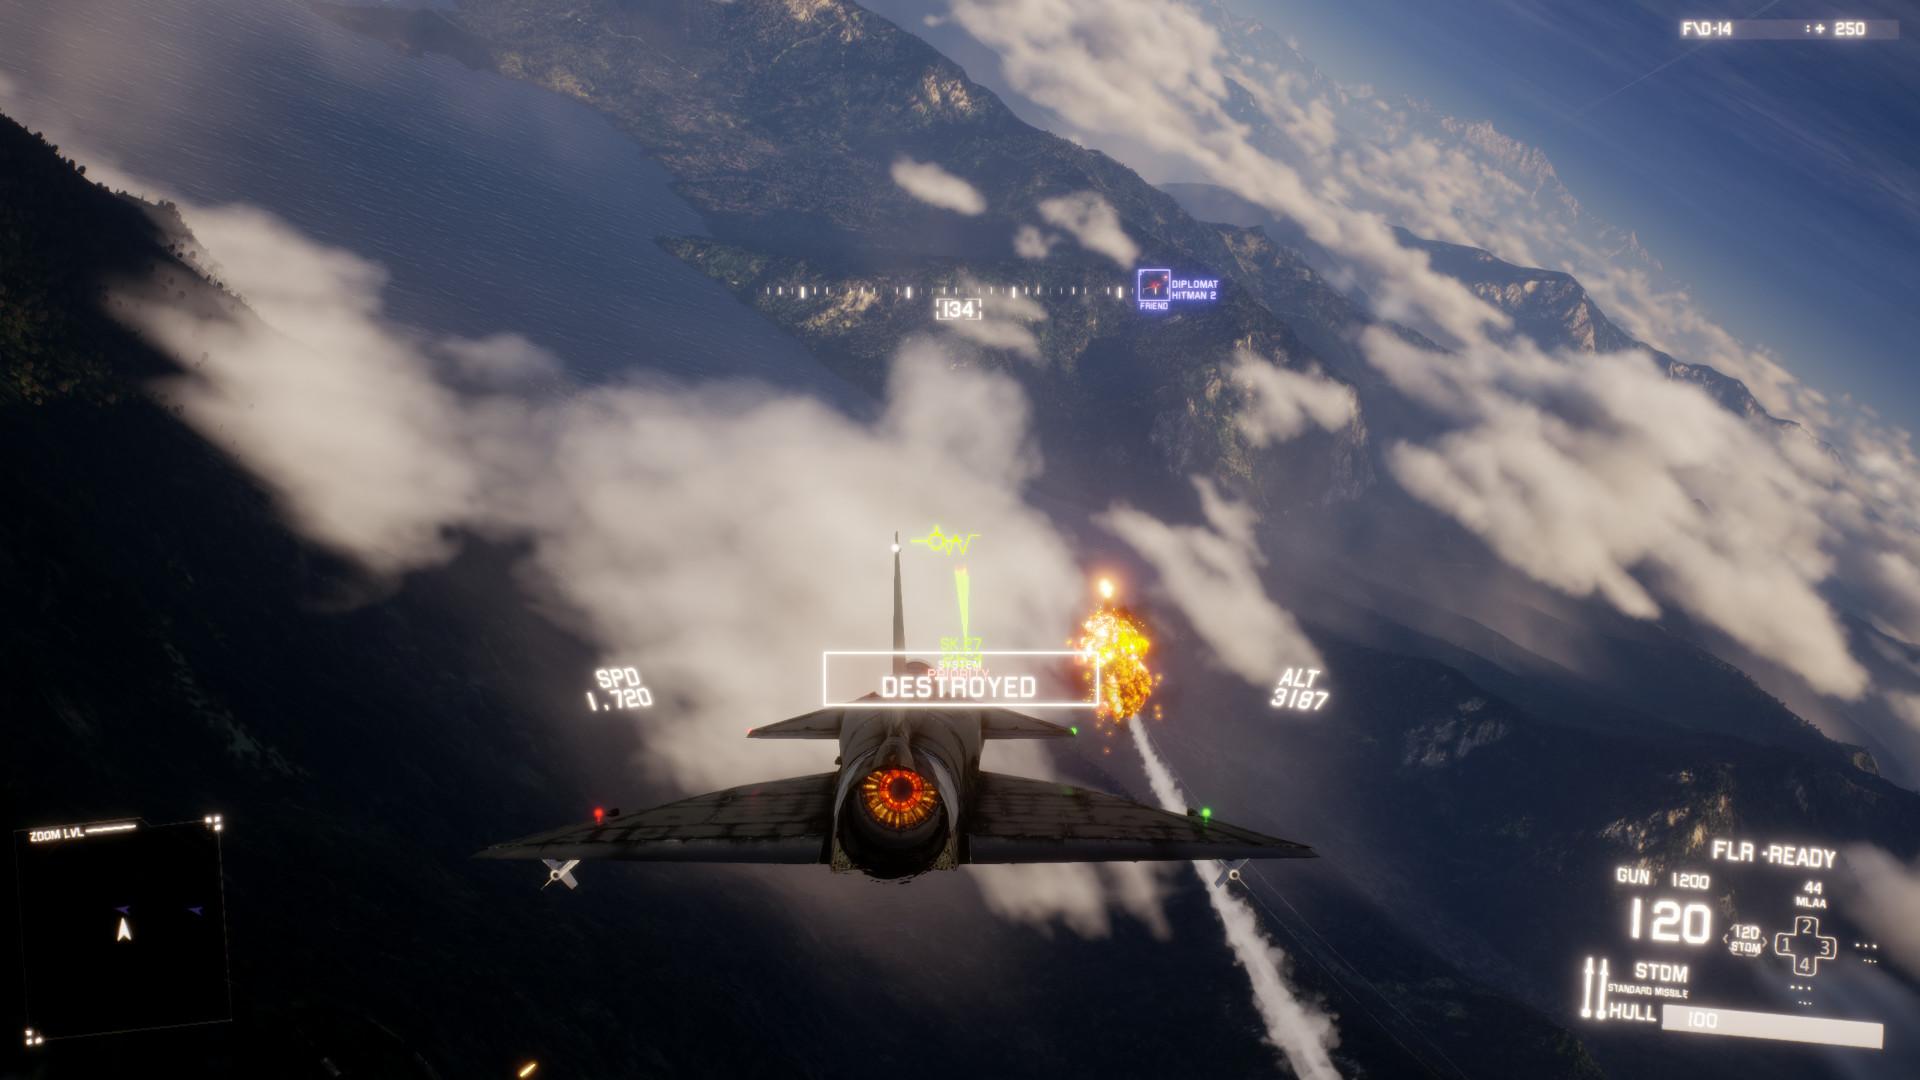 project-wingman-pc-screenshot-02